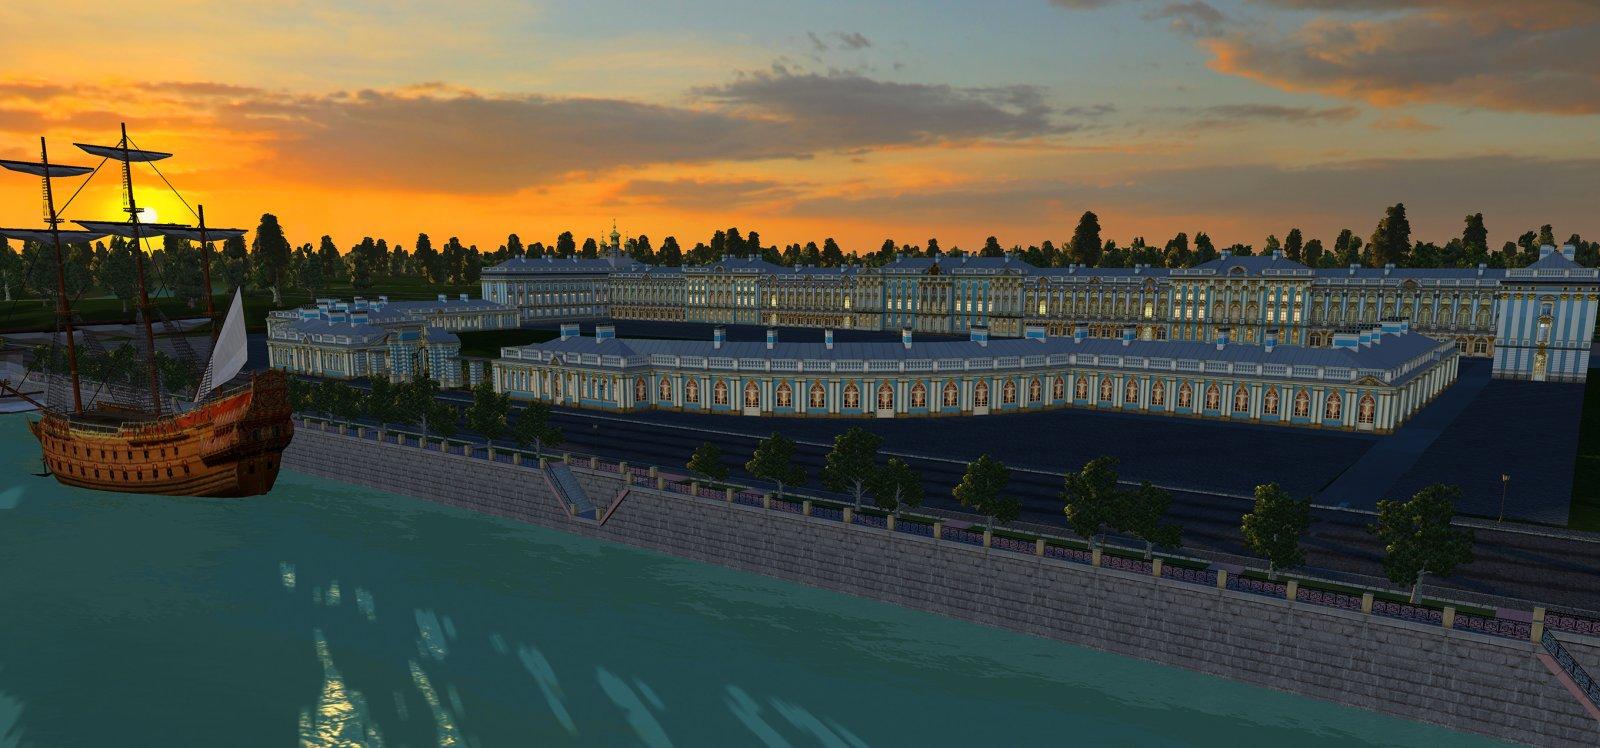 Екатерининский дворец закат.jpg